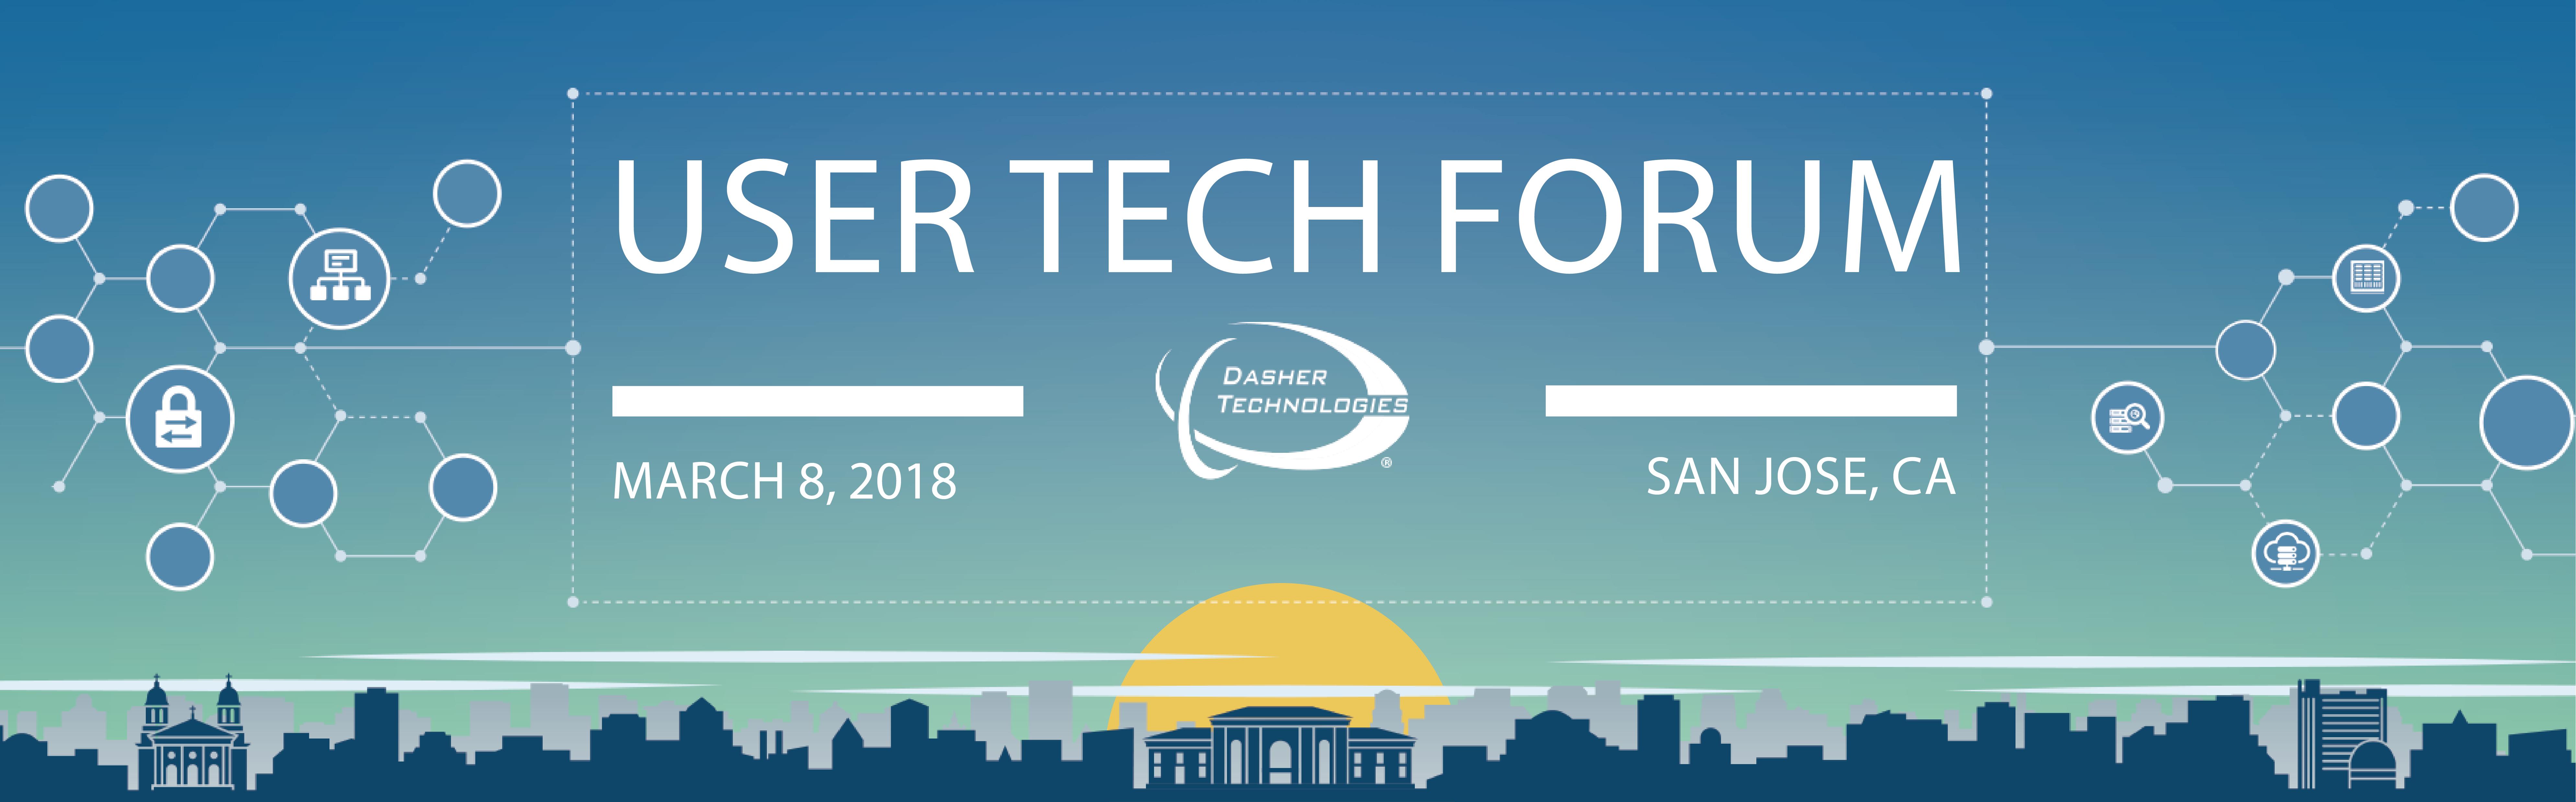 User Technology Forum – San Jose, CA